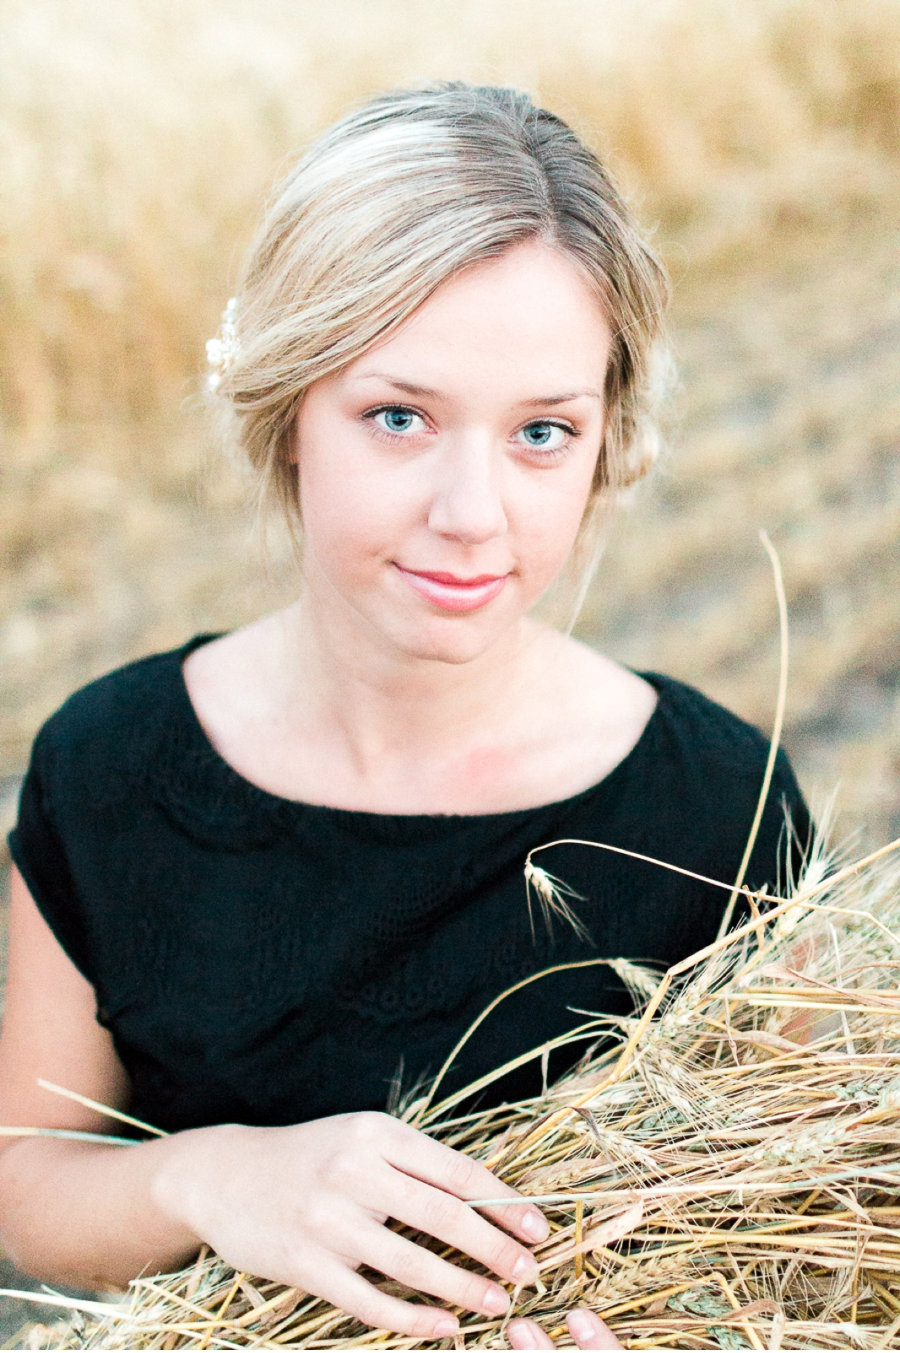 Wheatfield-Harvest-Wedding-Inspiration